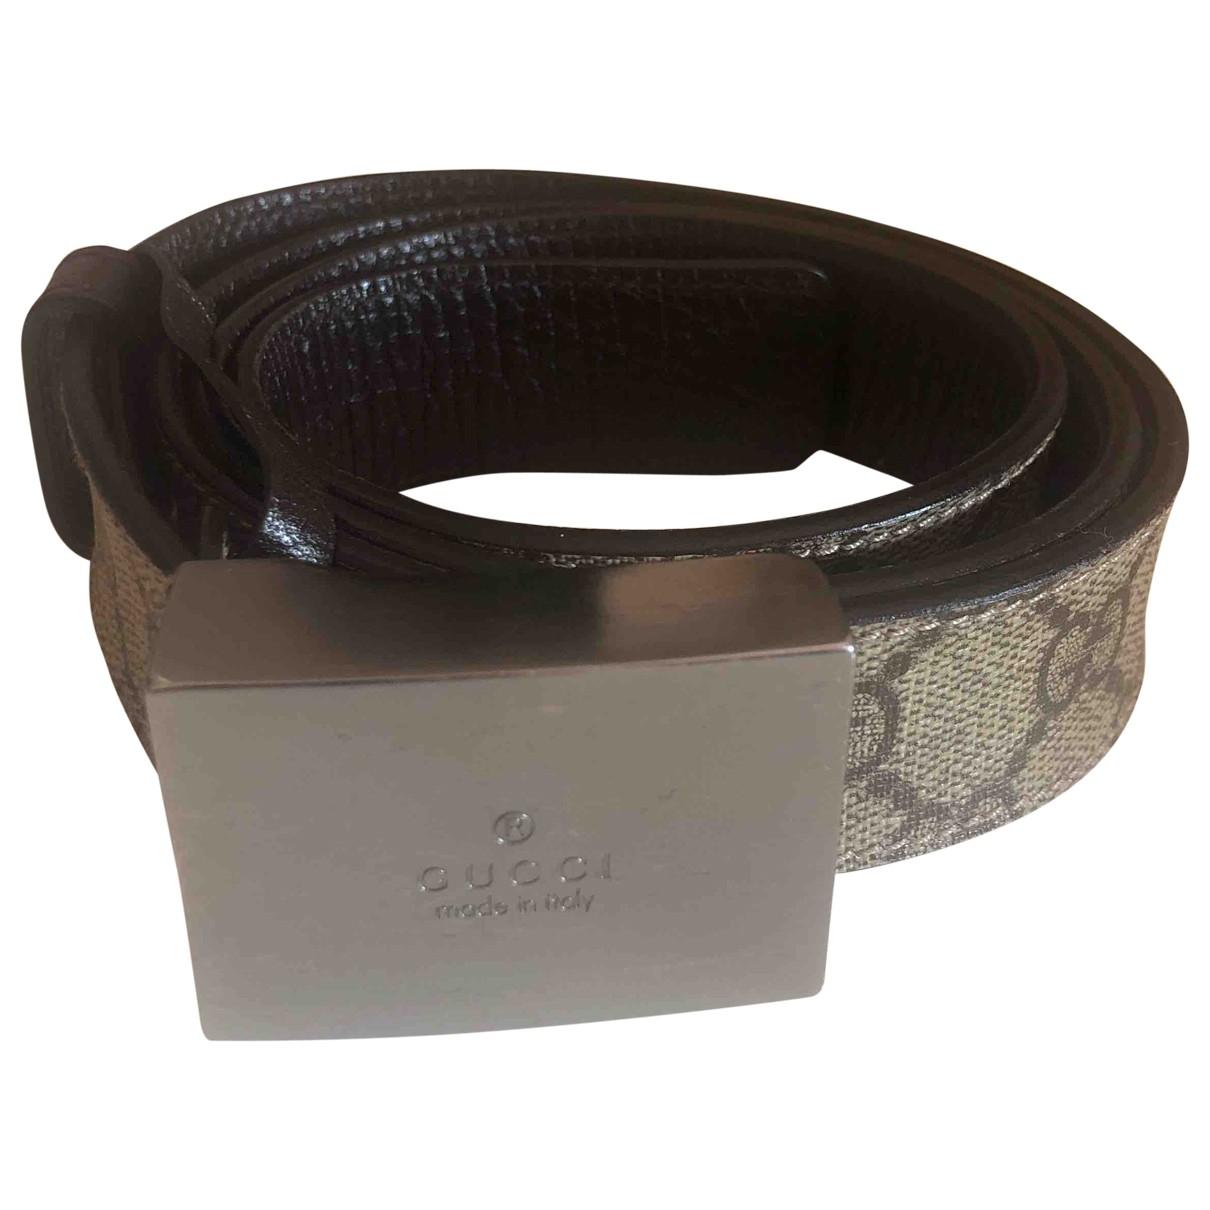 Gucci \N Brown Cloth belt for Women M International